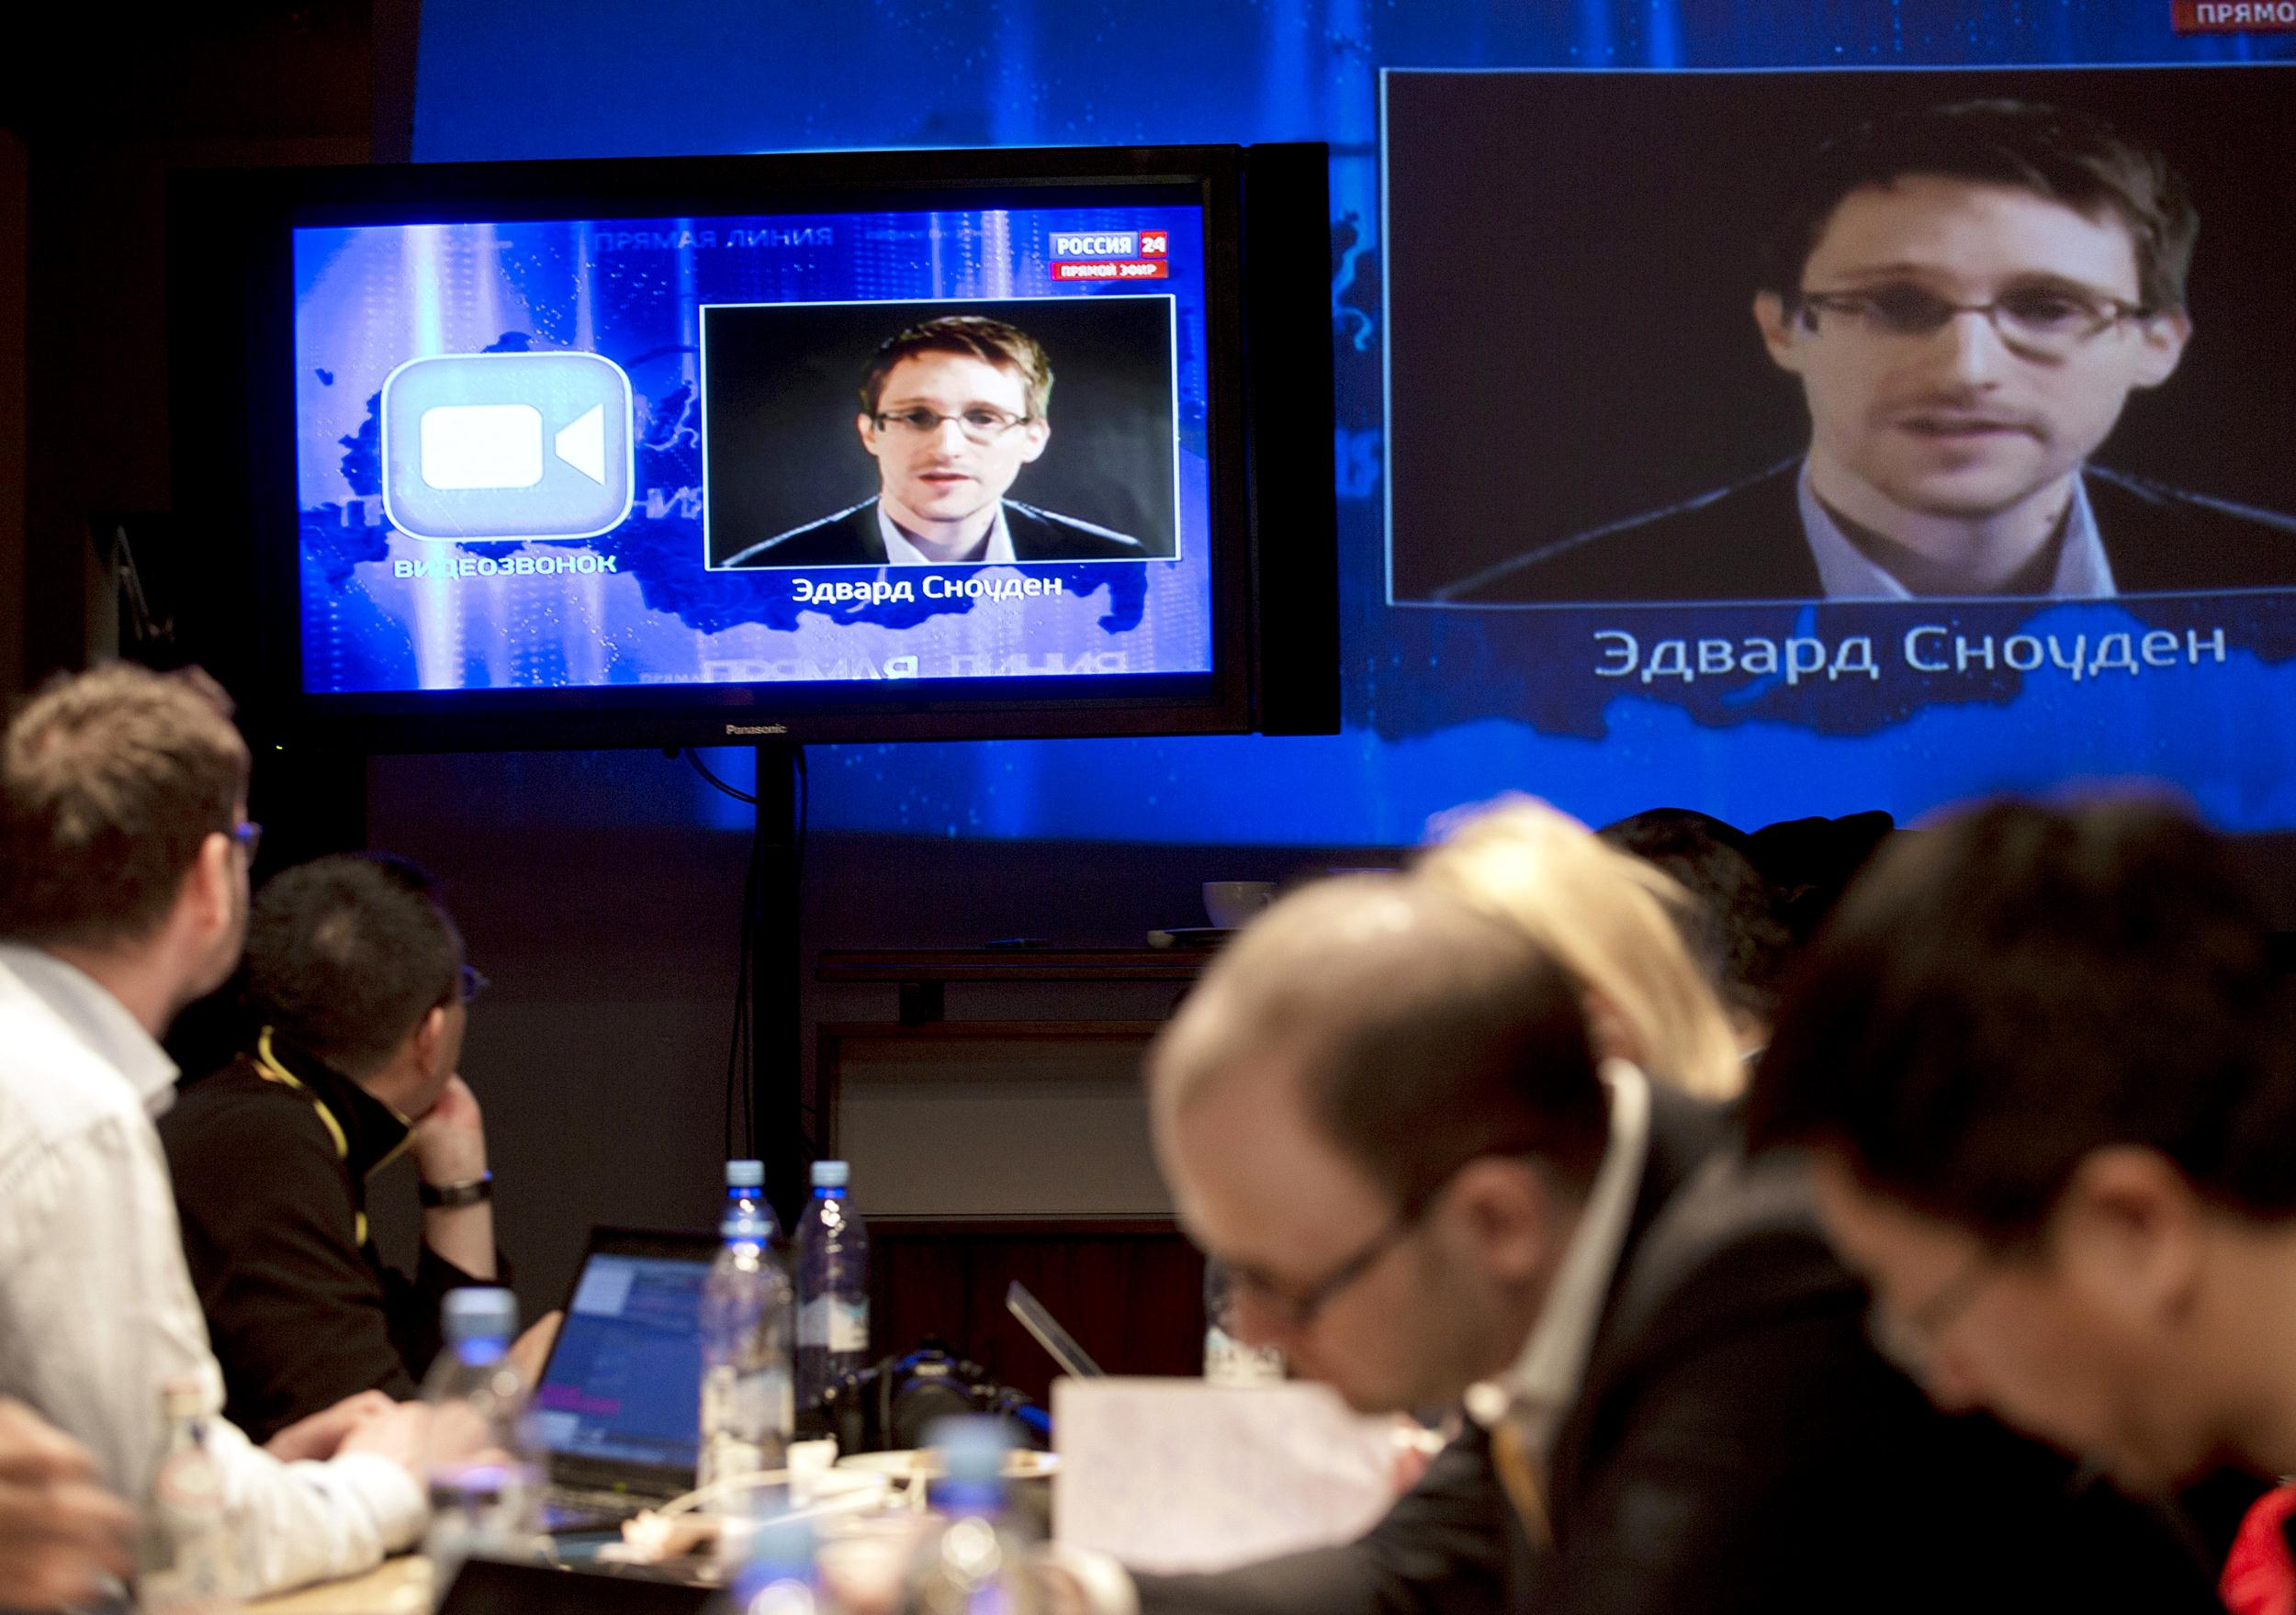 Image: Vladimir Putin, Edward Snowden